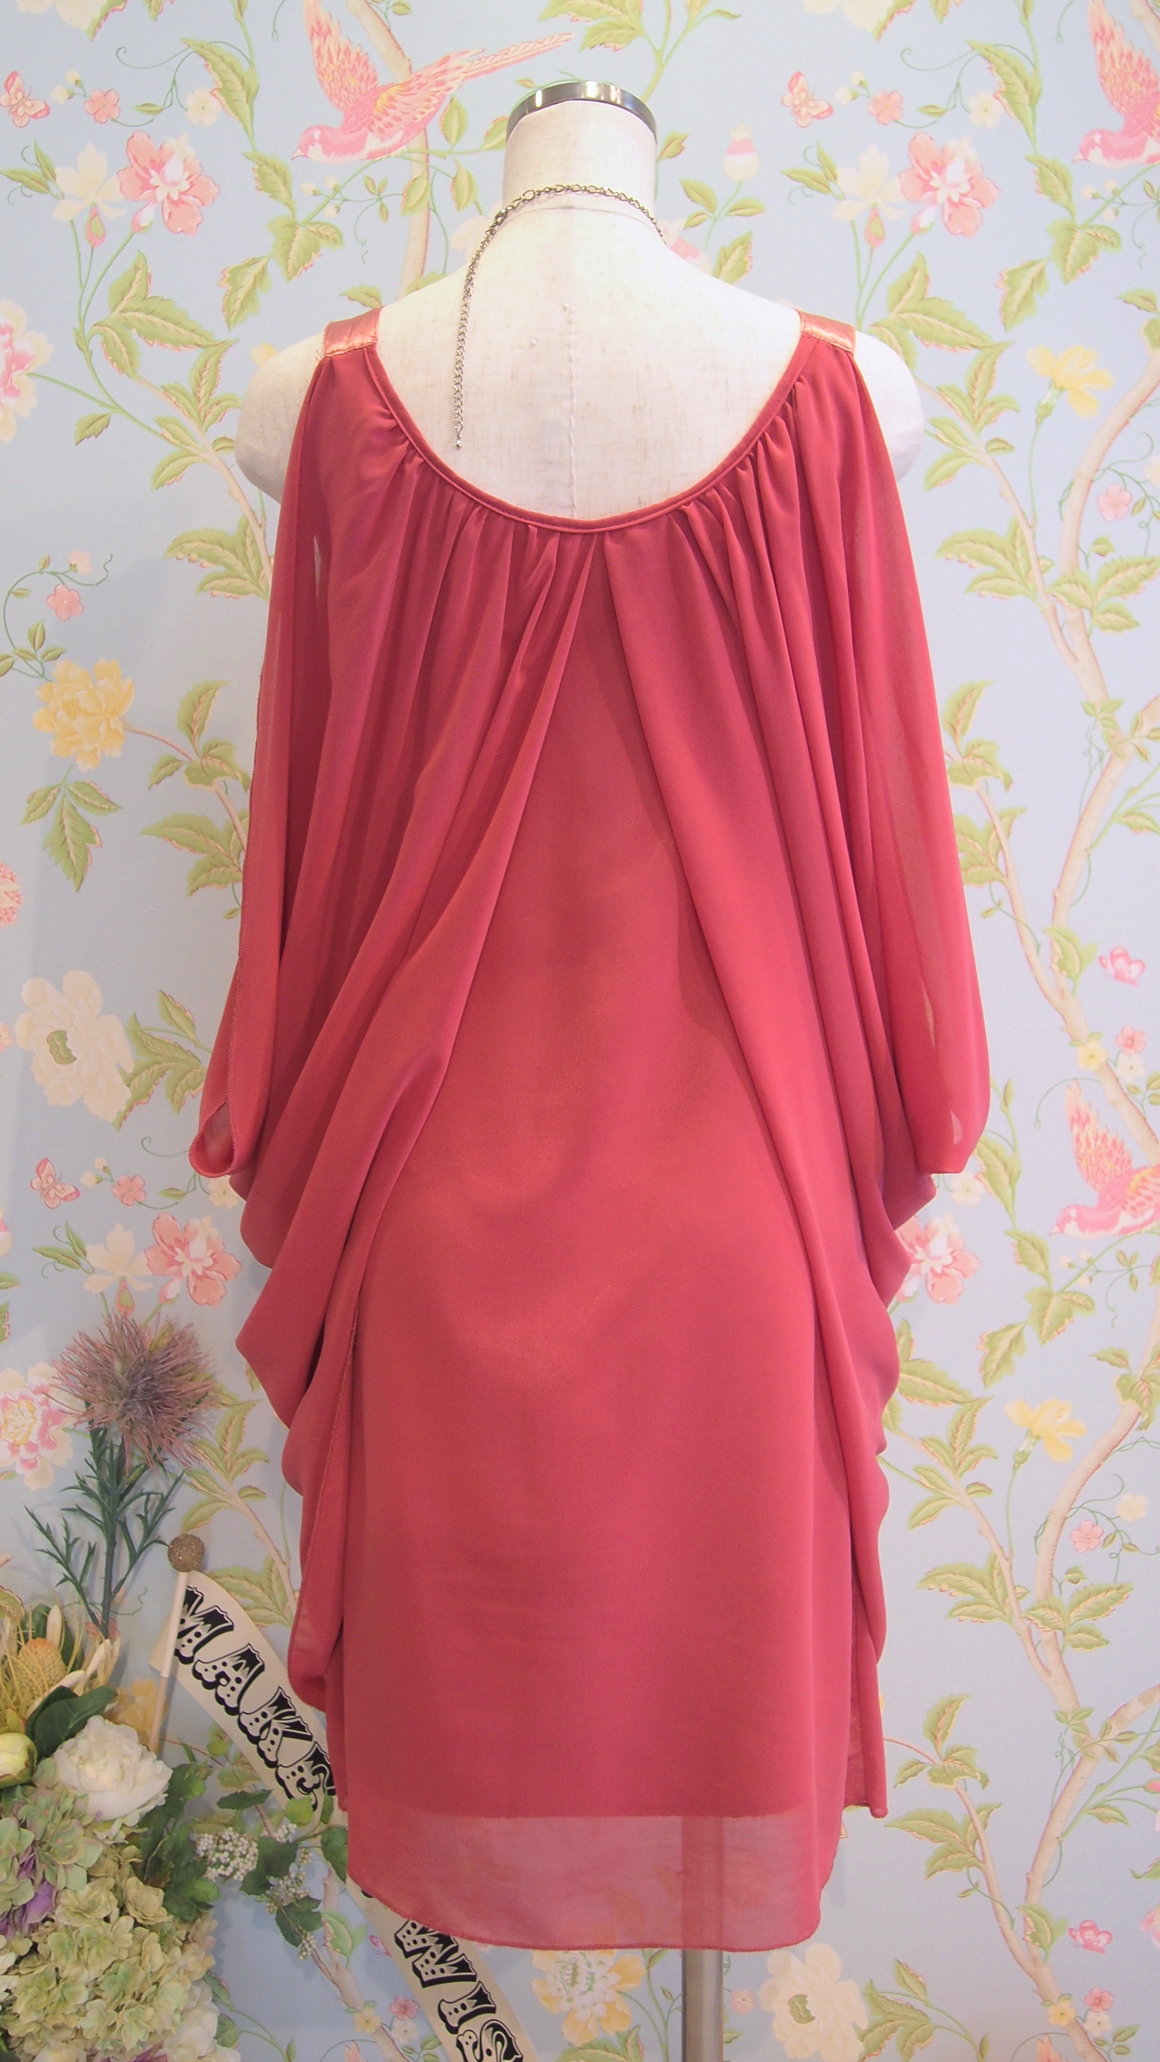 nr_dress_161